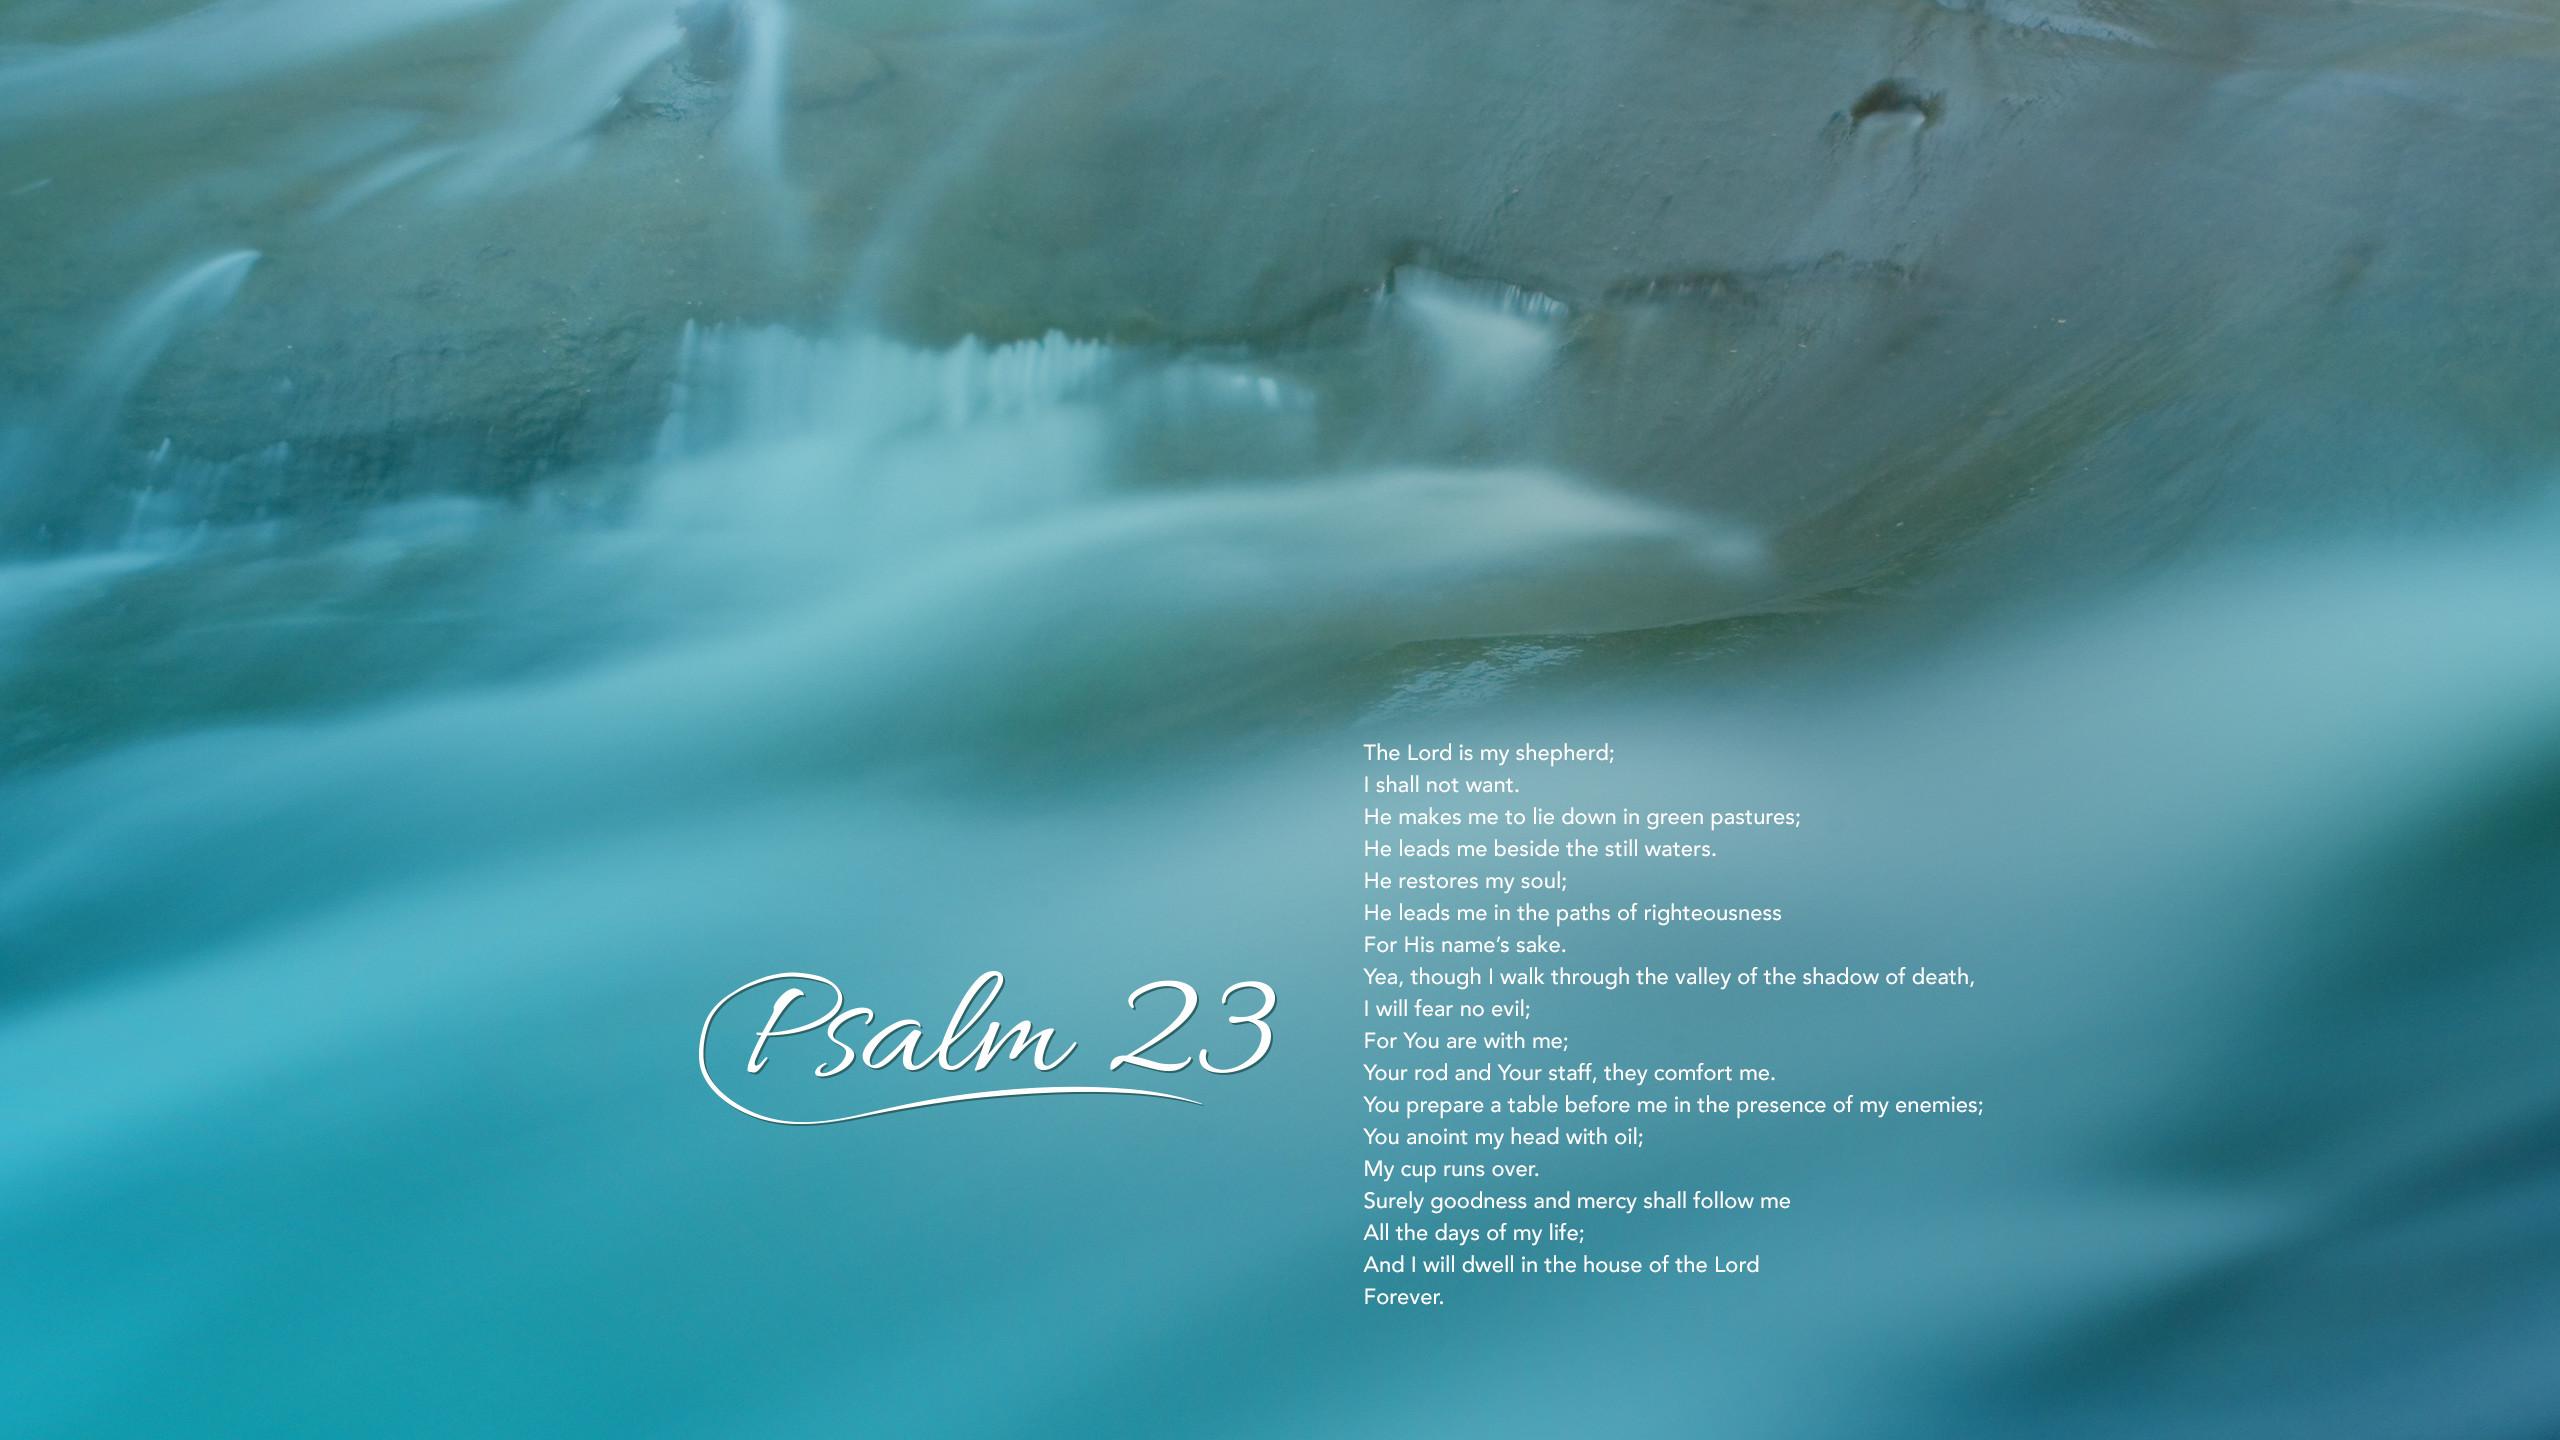 psalm 23 wallpaper 183��